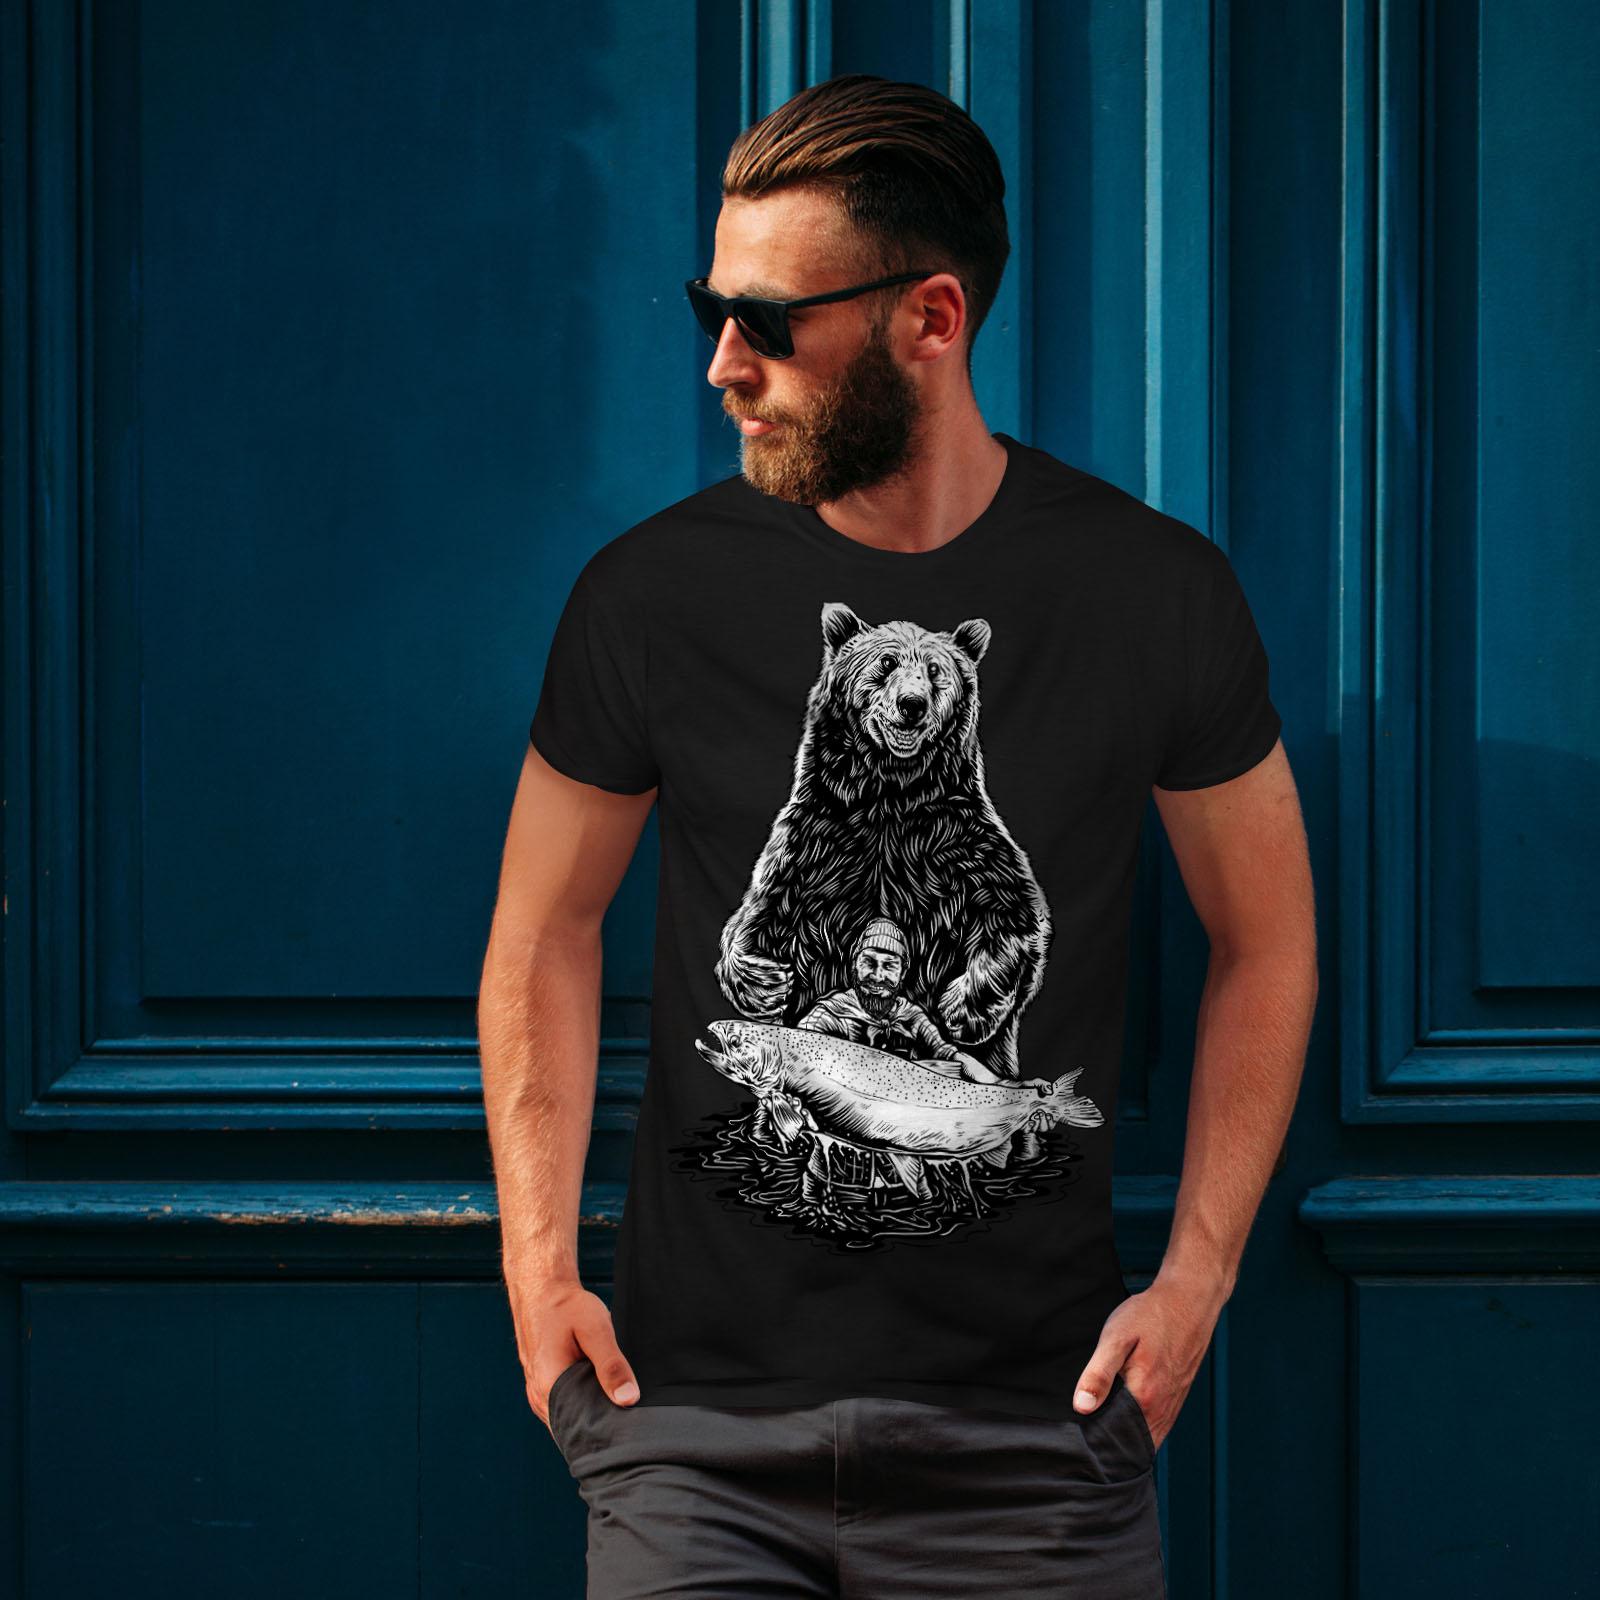 miniature 4 - Wellcoda Fishing Bear Angler Mens T-shirt, Grizzly Graphic Design Printed Tee